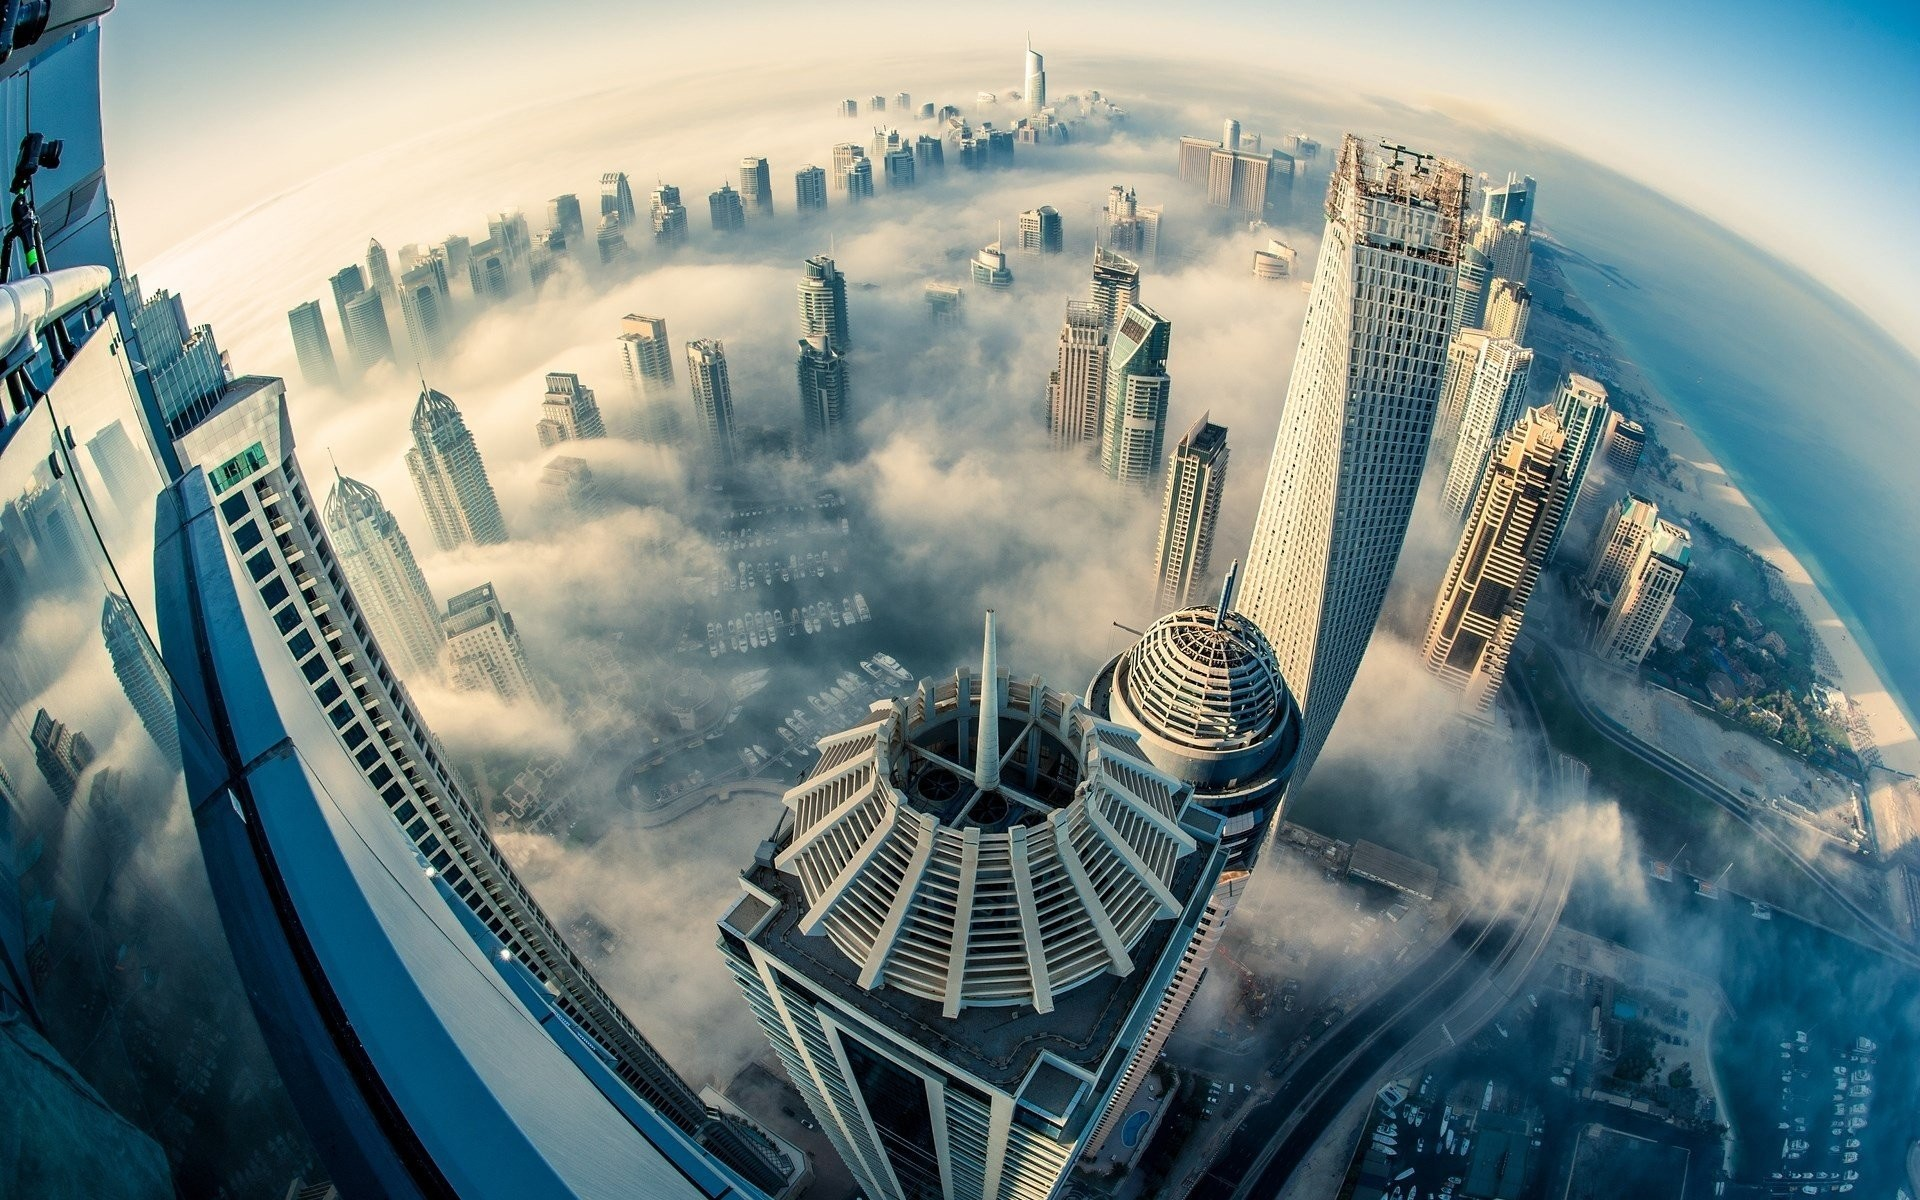 City dubai cloud fog building hd wallpaper 255750 ….jpg, 4K …